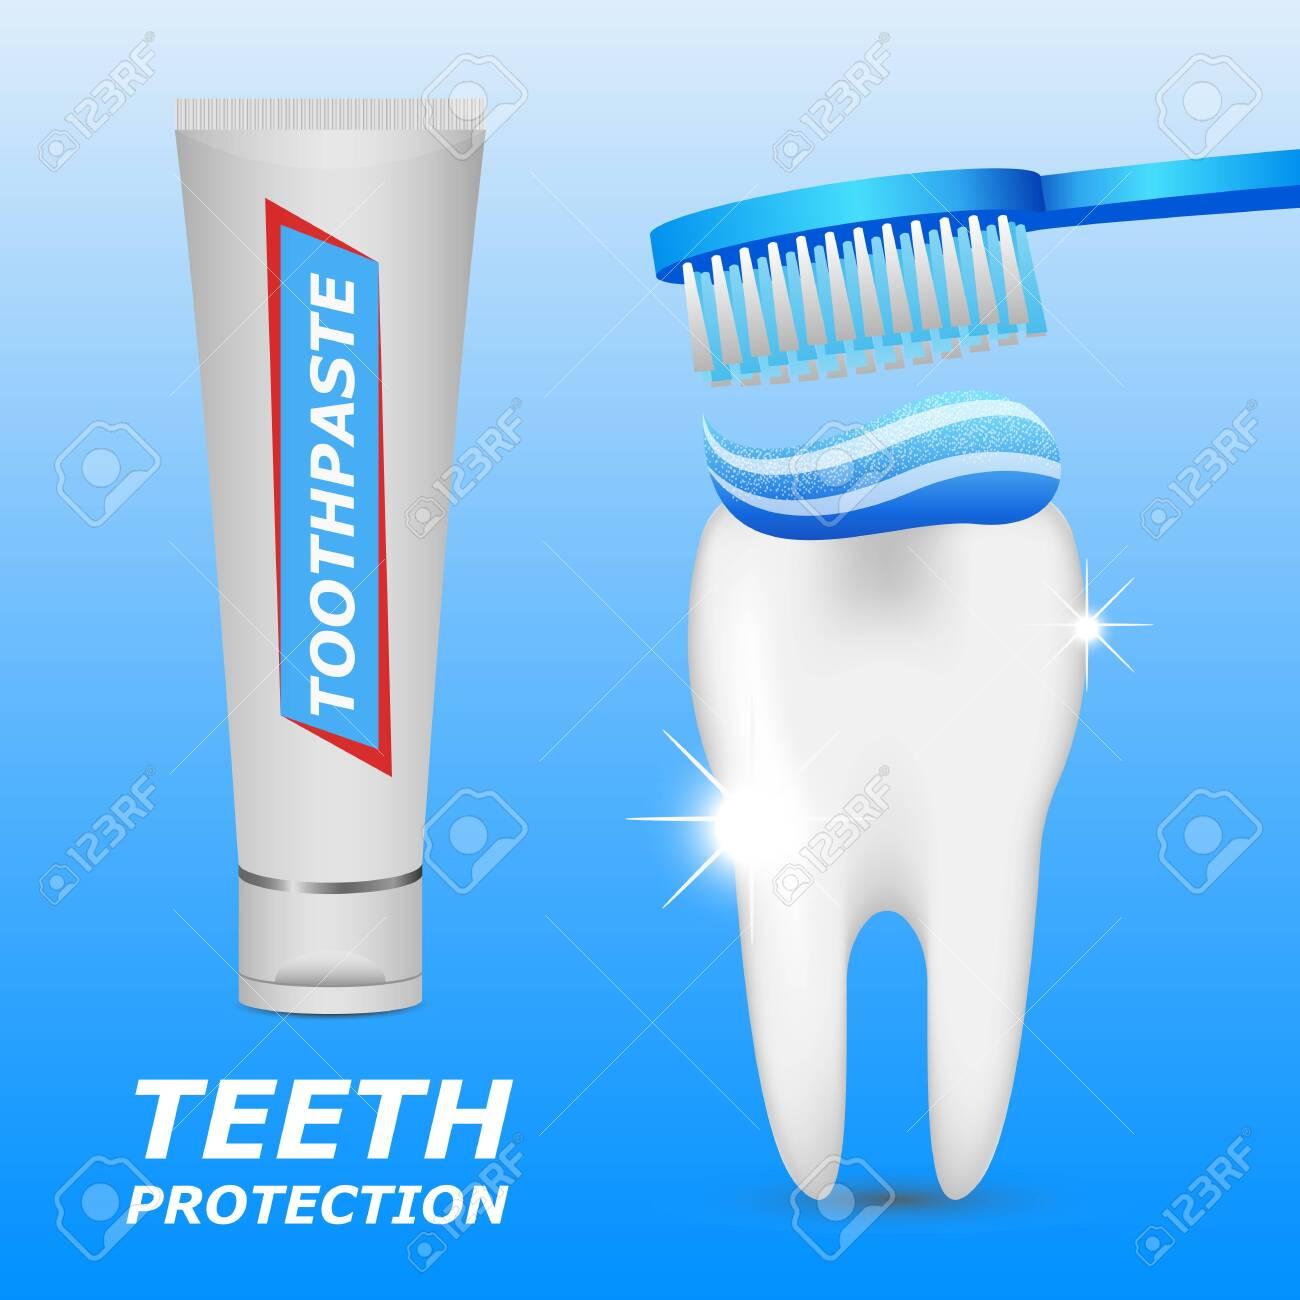 Dental hygiene vector design illustration isolated on blue background - 151092276